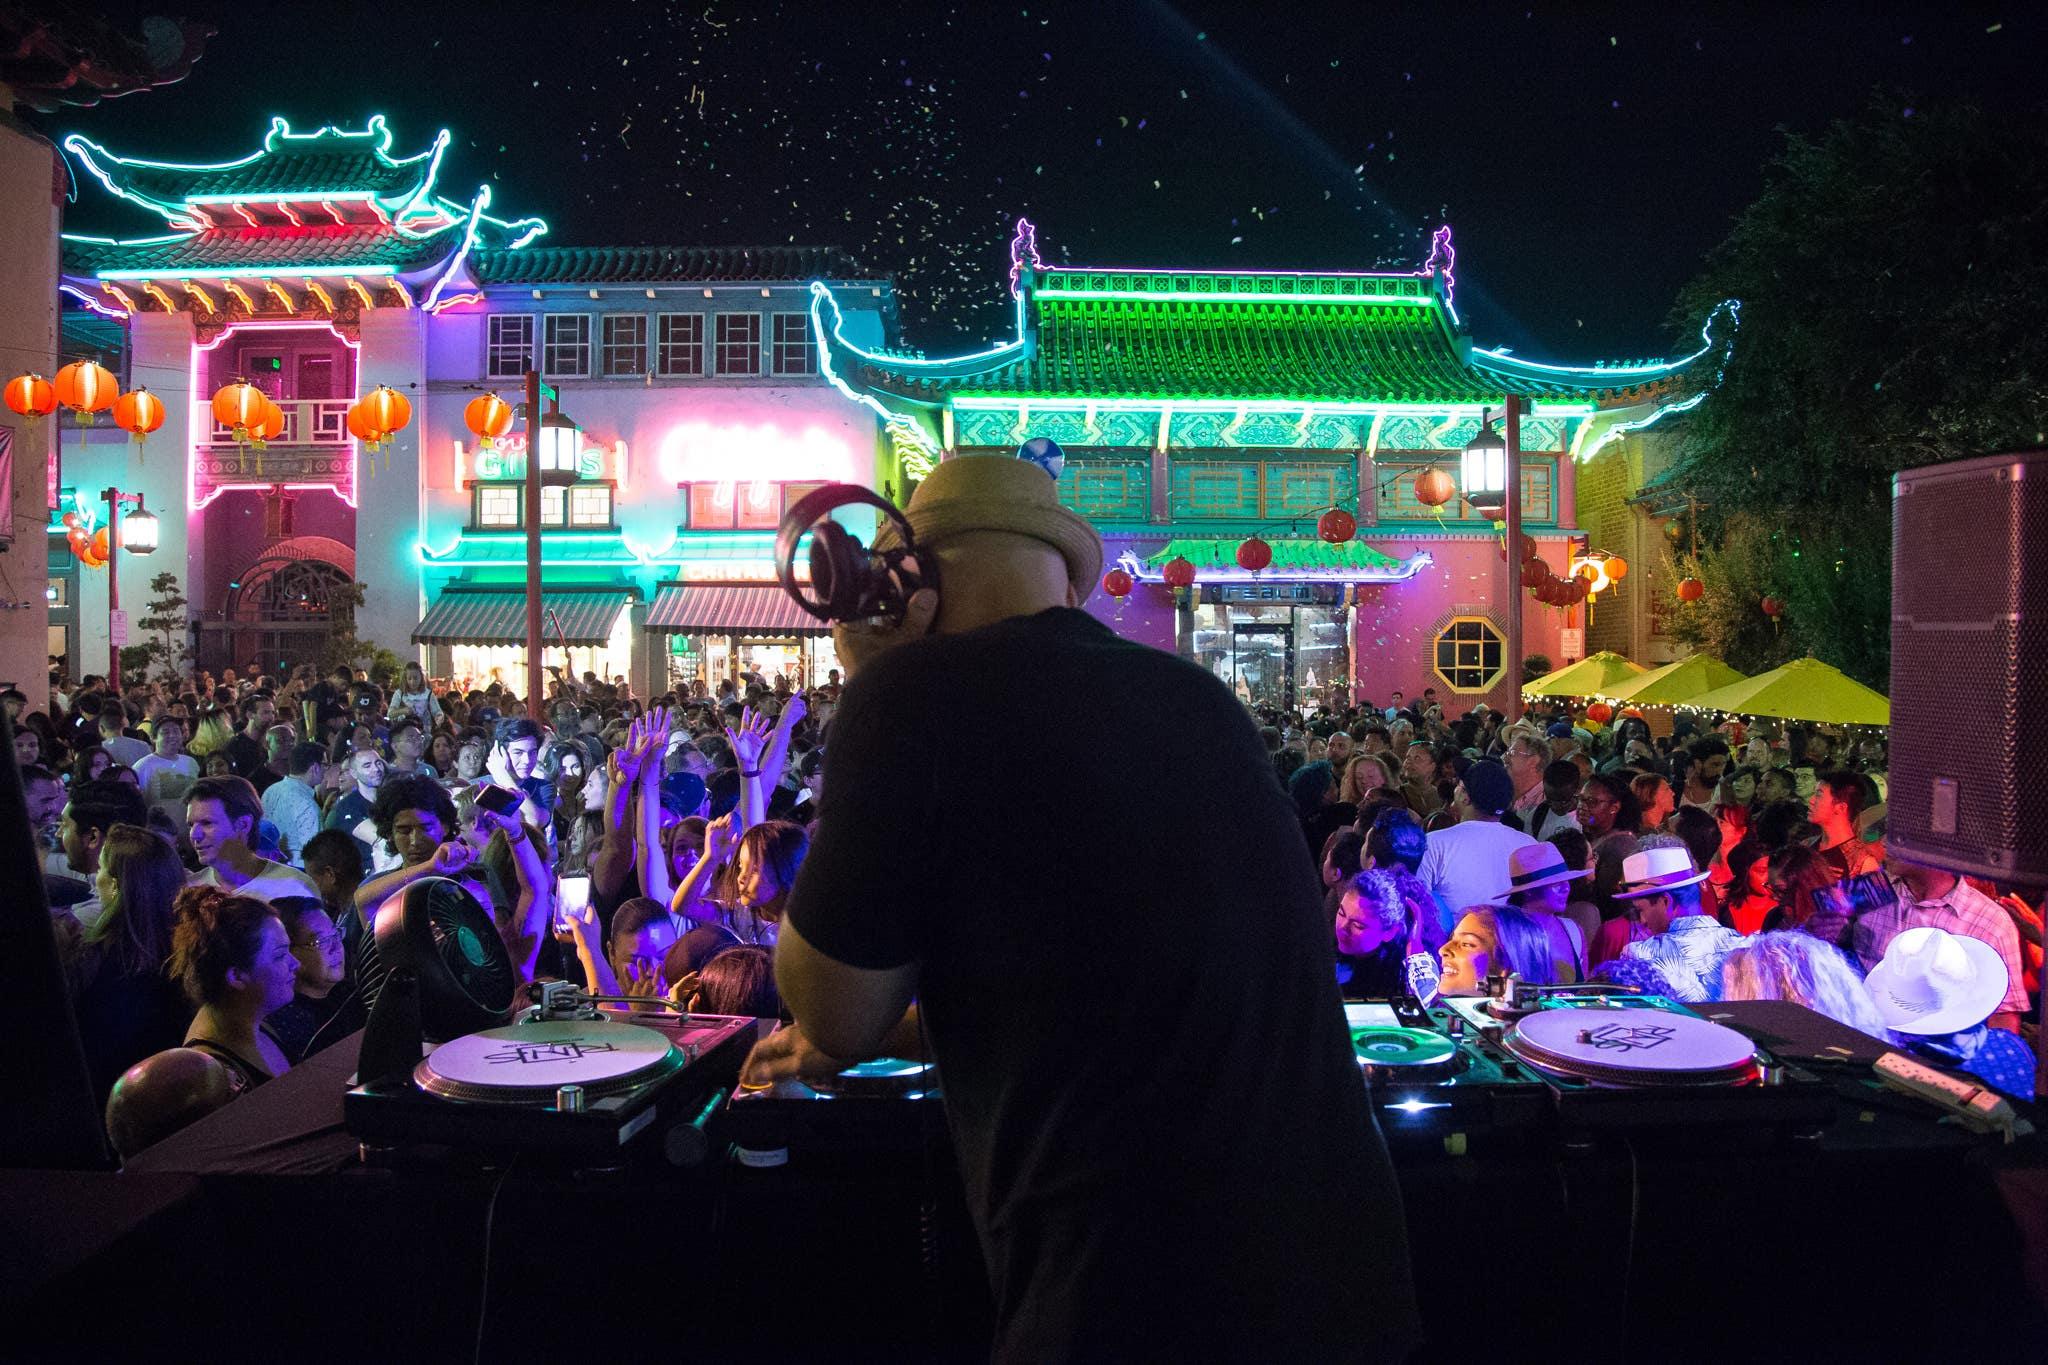 KCRW Summer Nights at Chinatown Central Plaza